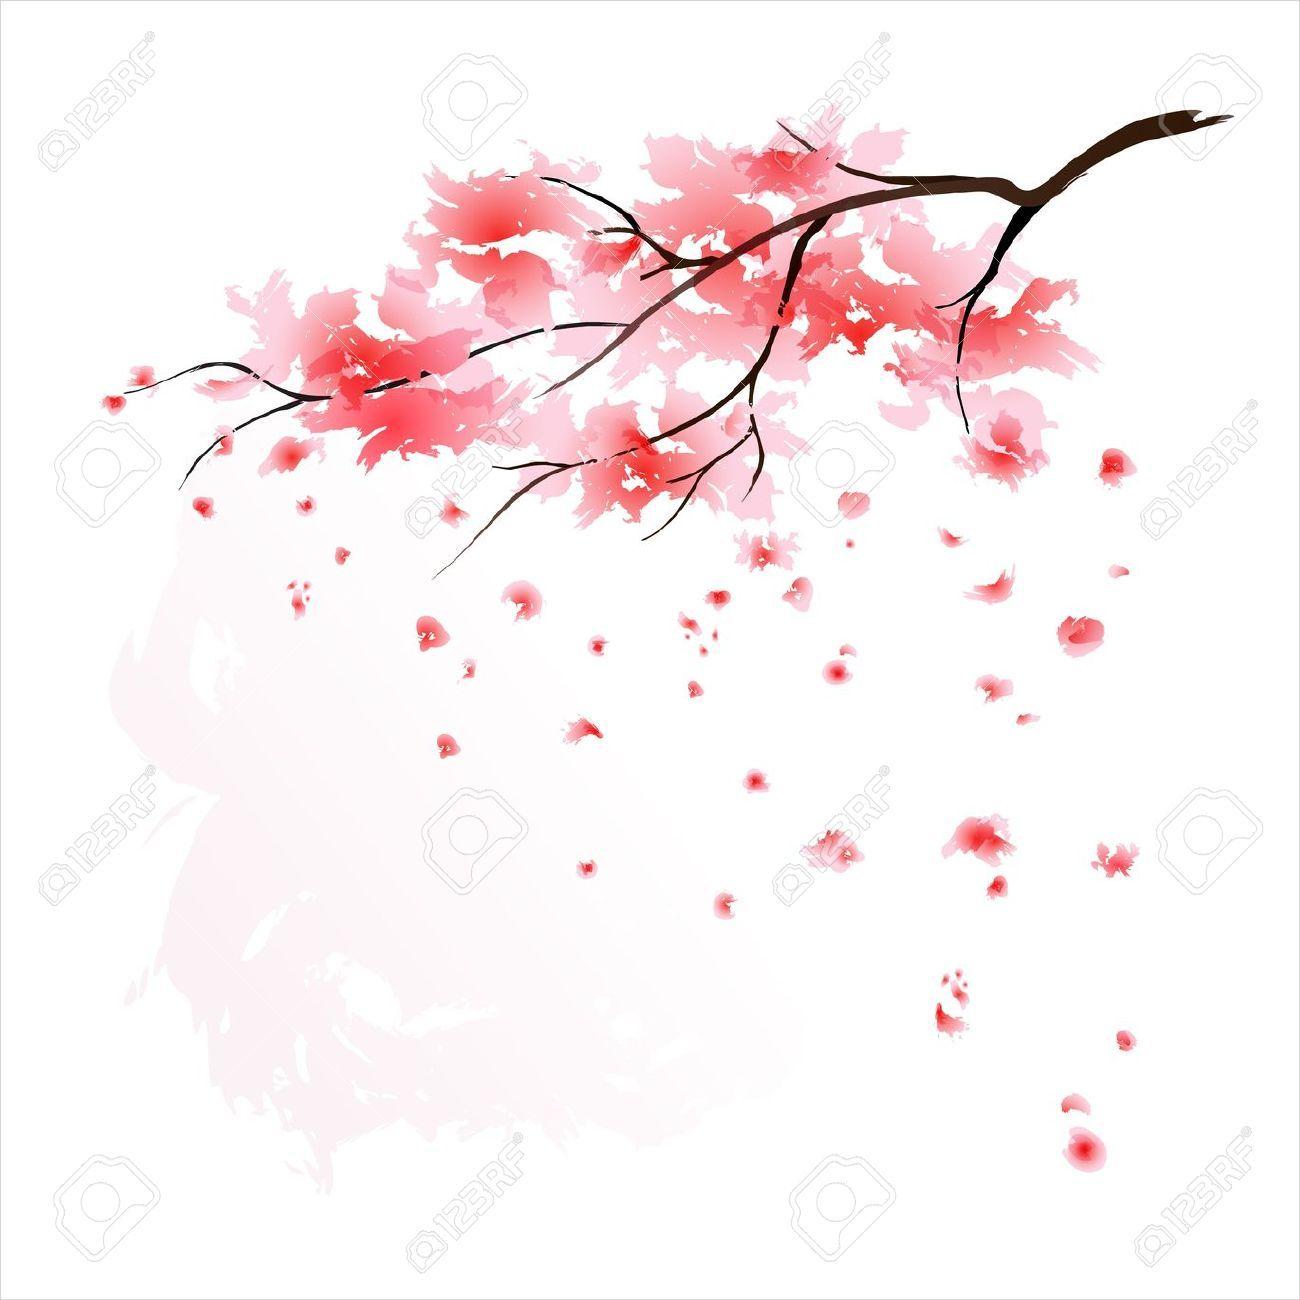 Cherry Blossoms Falling Stylized Wallpaper Sakura Branch Artwork Google Search Tattoo Ideas